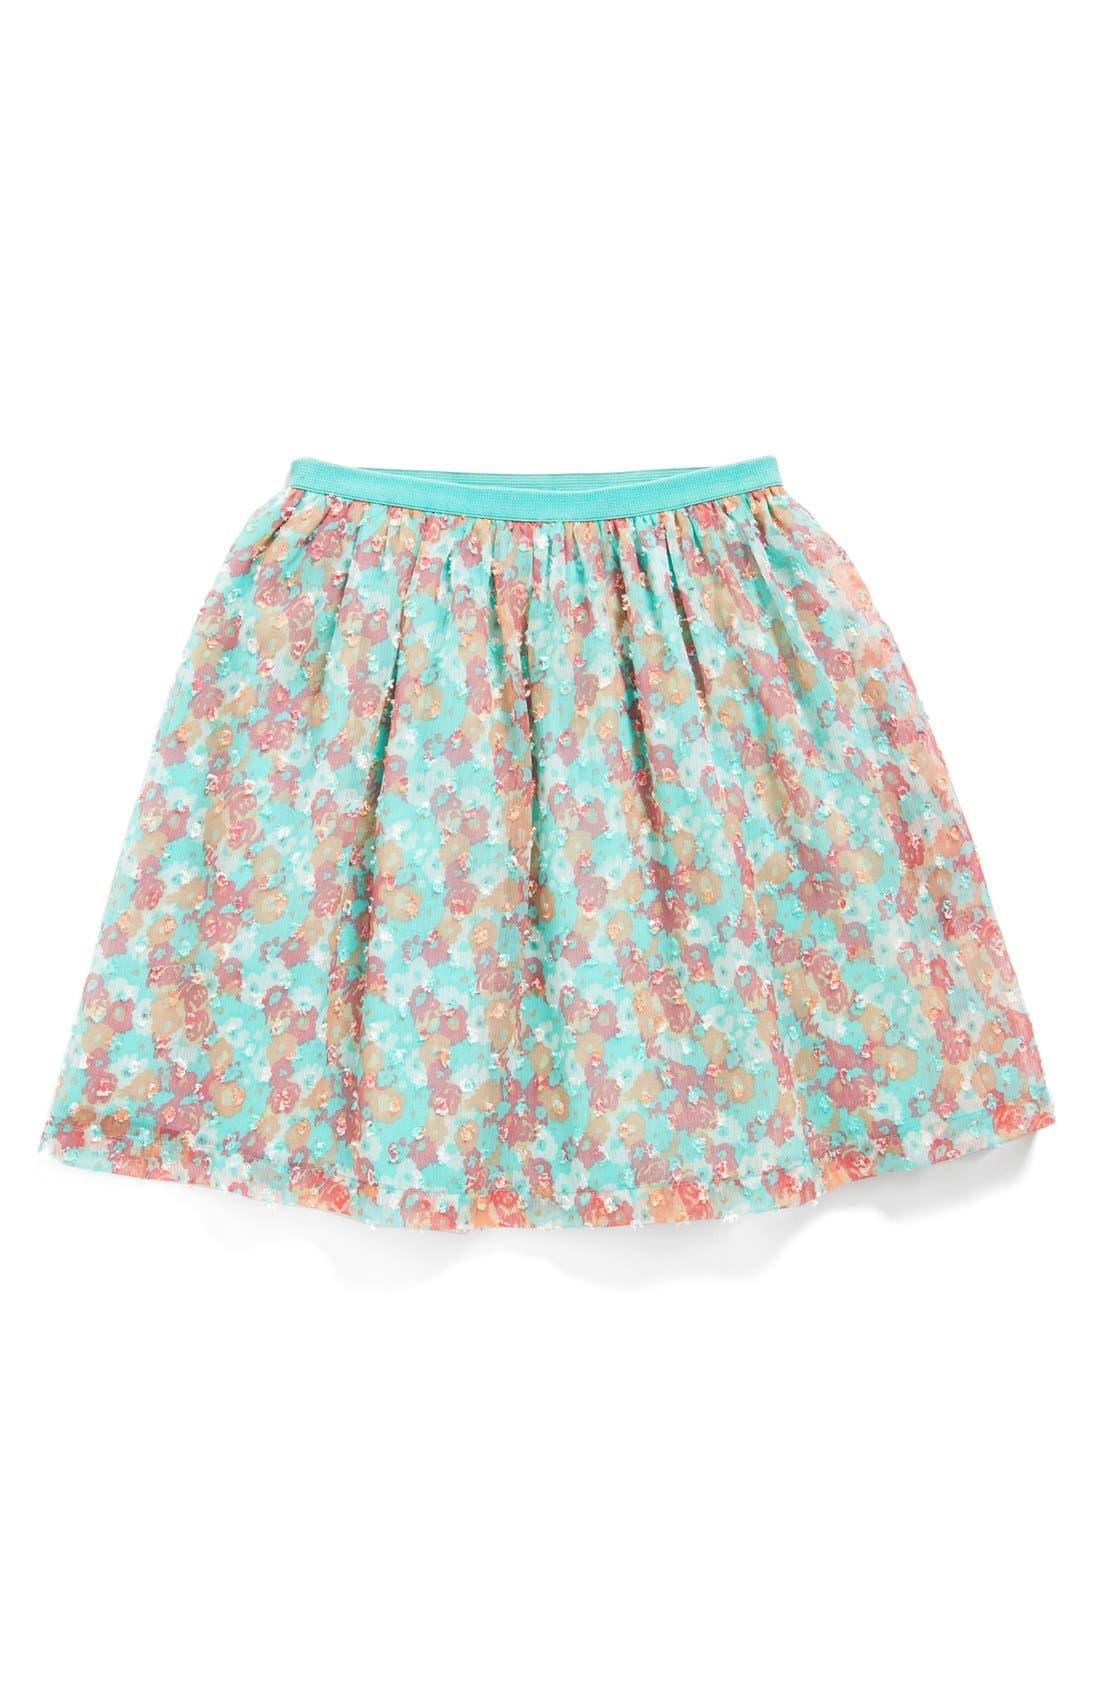 Main Image - Ruby & Bloom 'Miranda' Georgette Skirt (Big Girls)